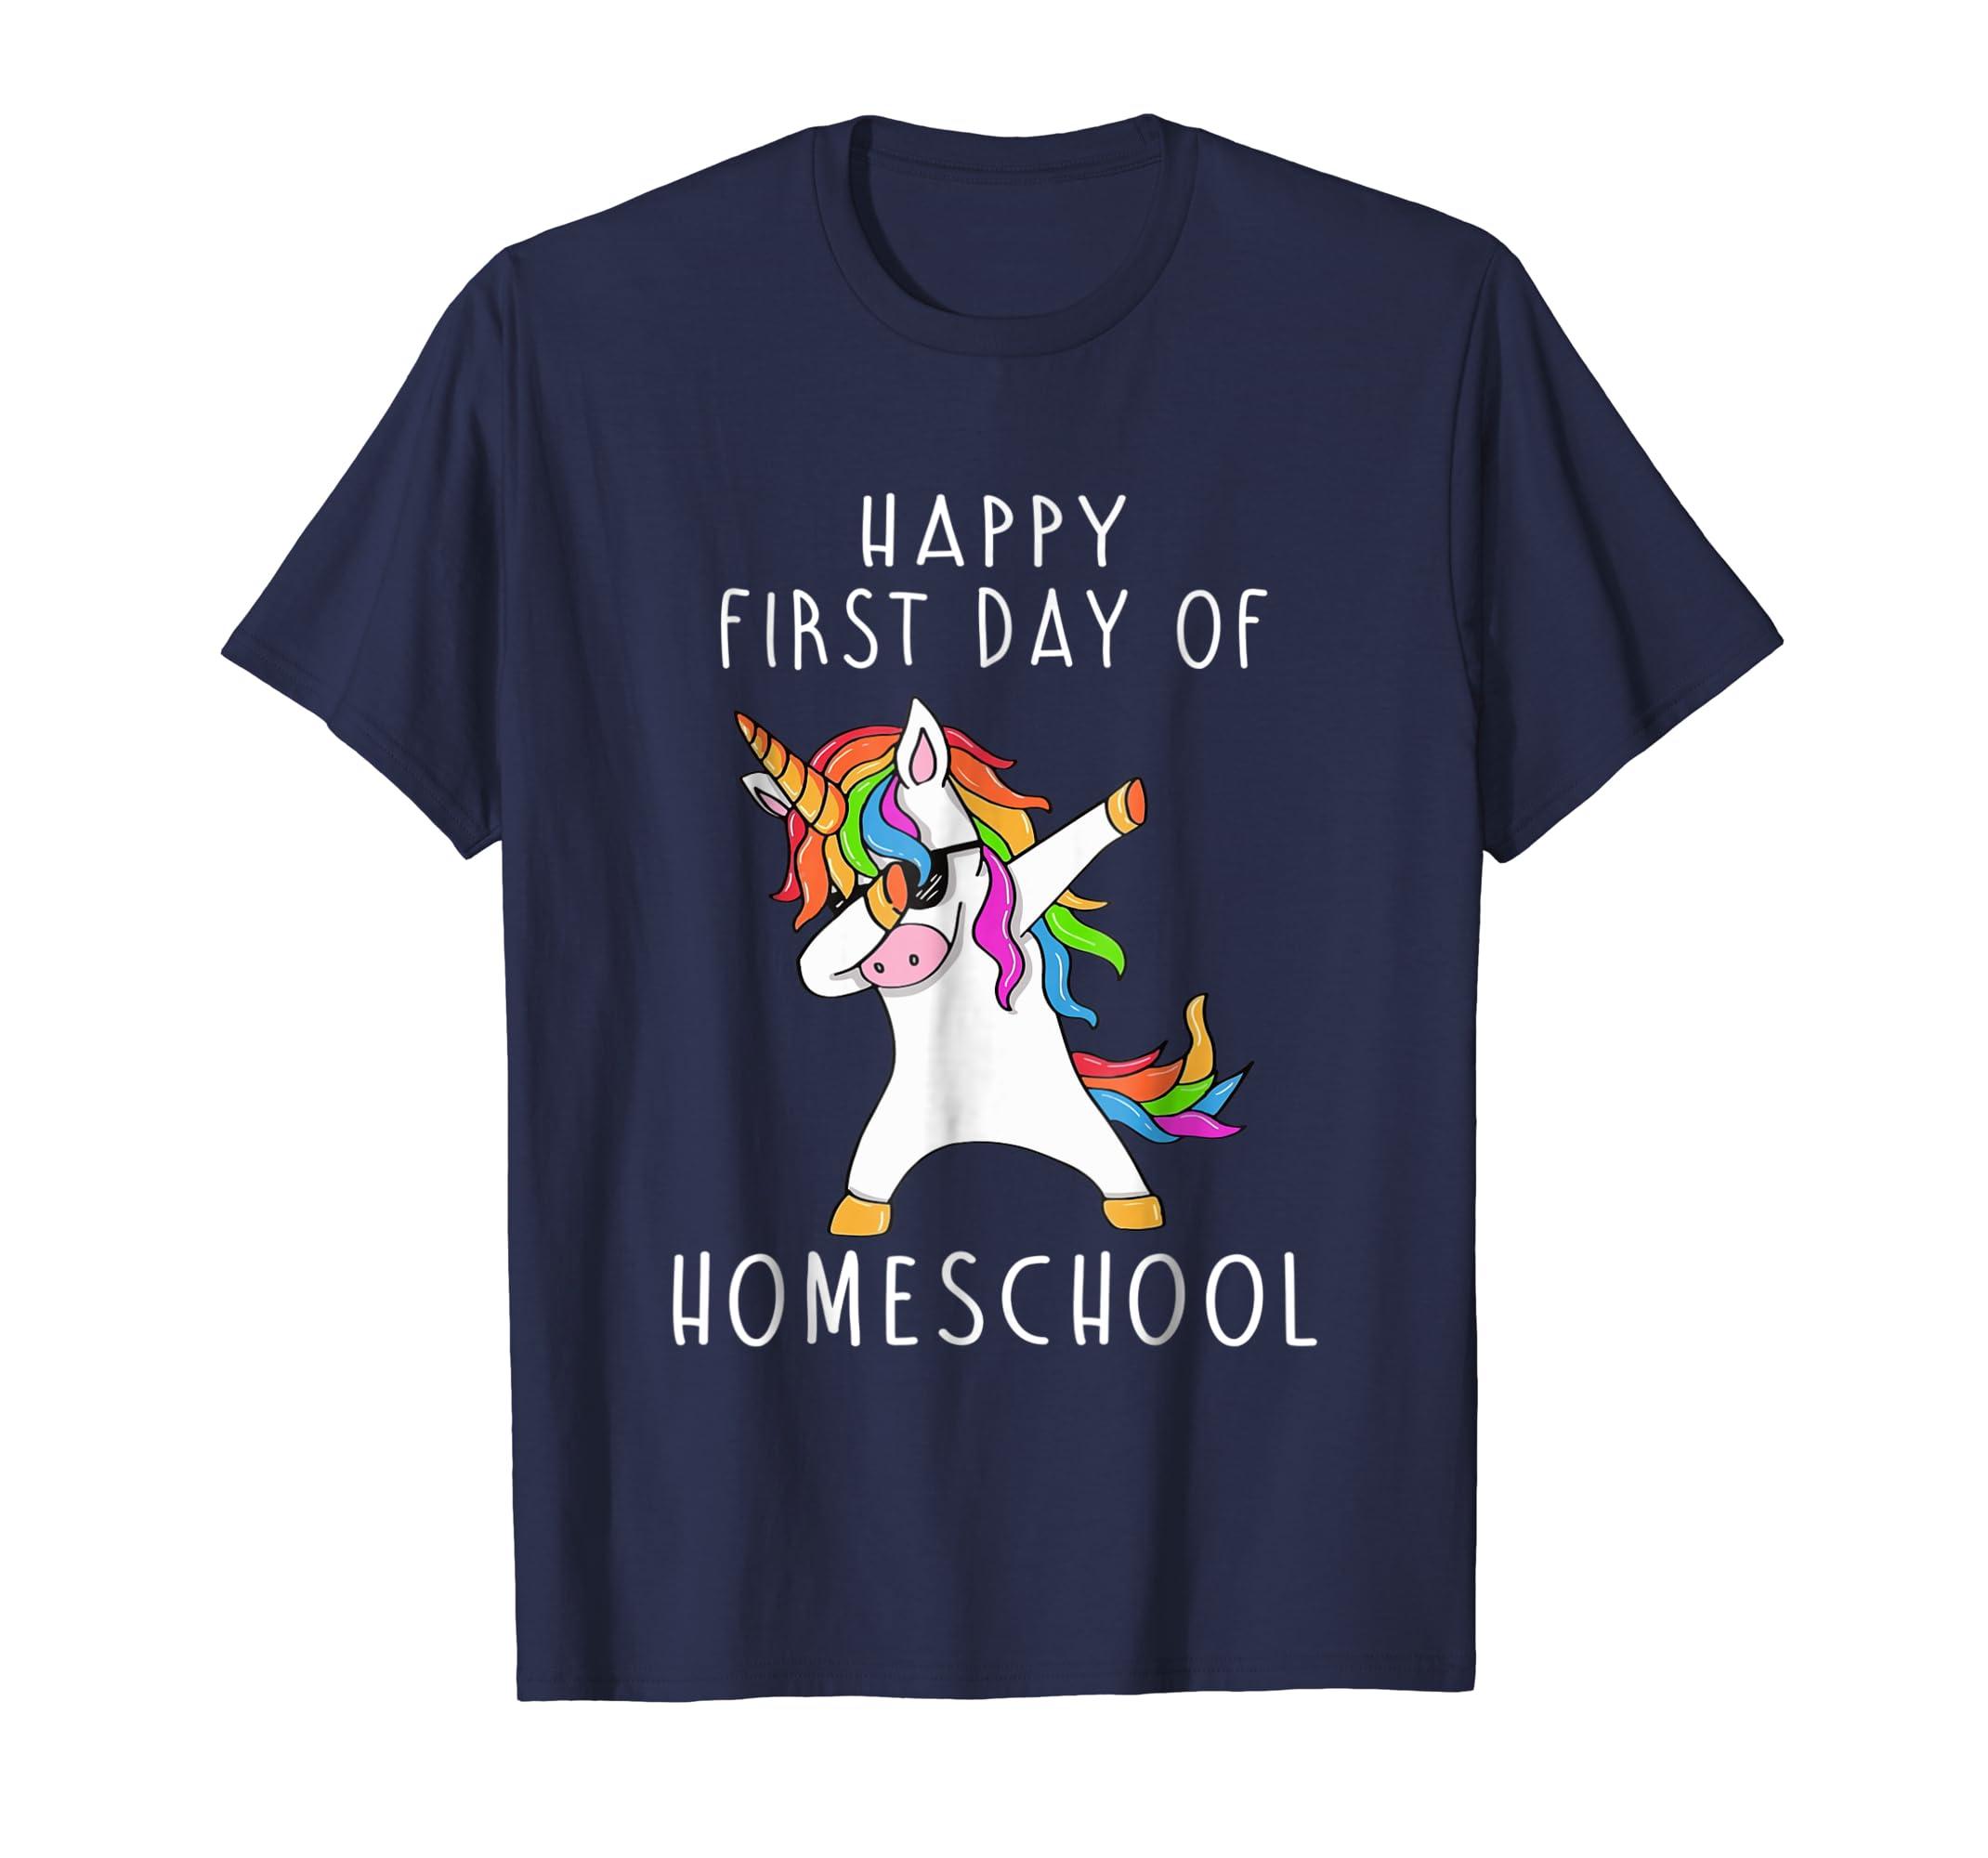 HOMESCHOOL Shirt   Happy First Day Of HOMESCHOOL Shirt-Teesml